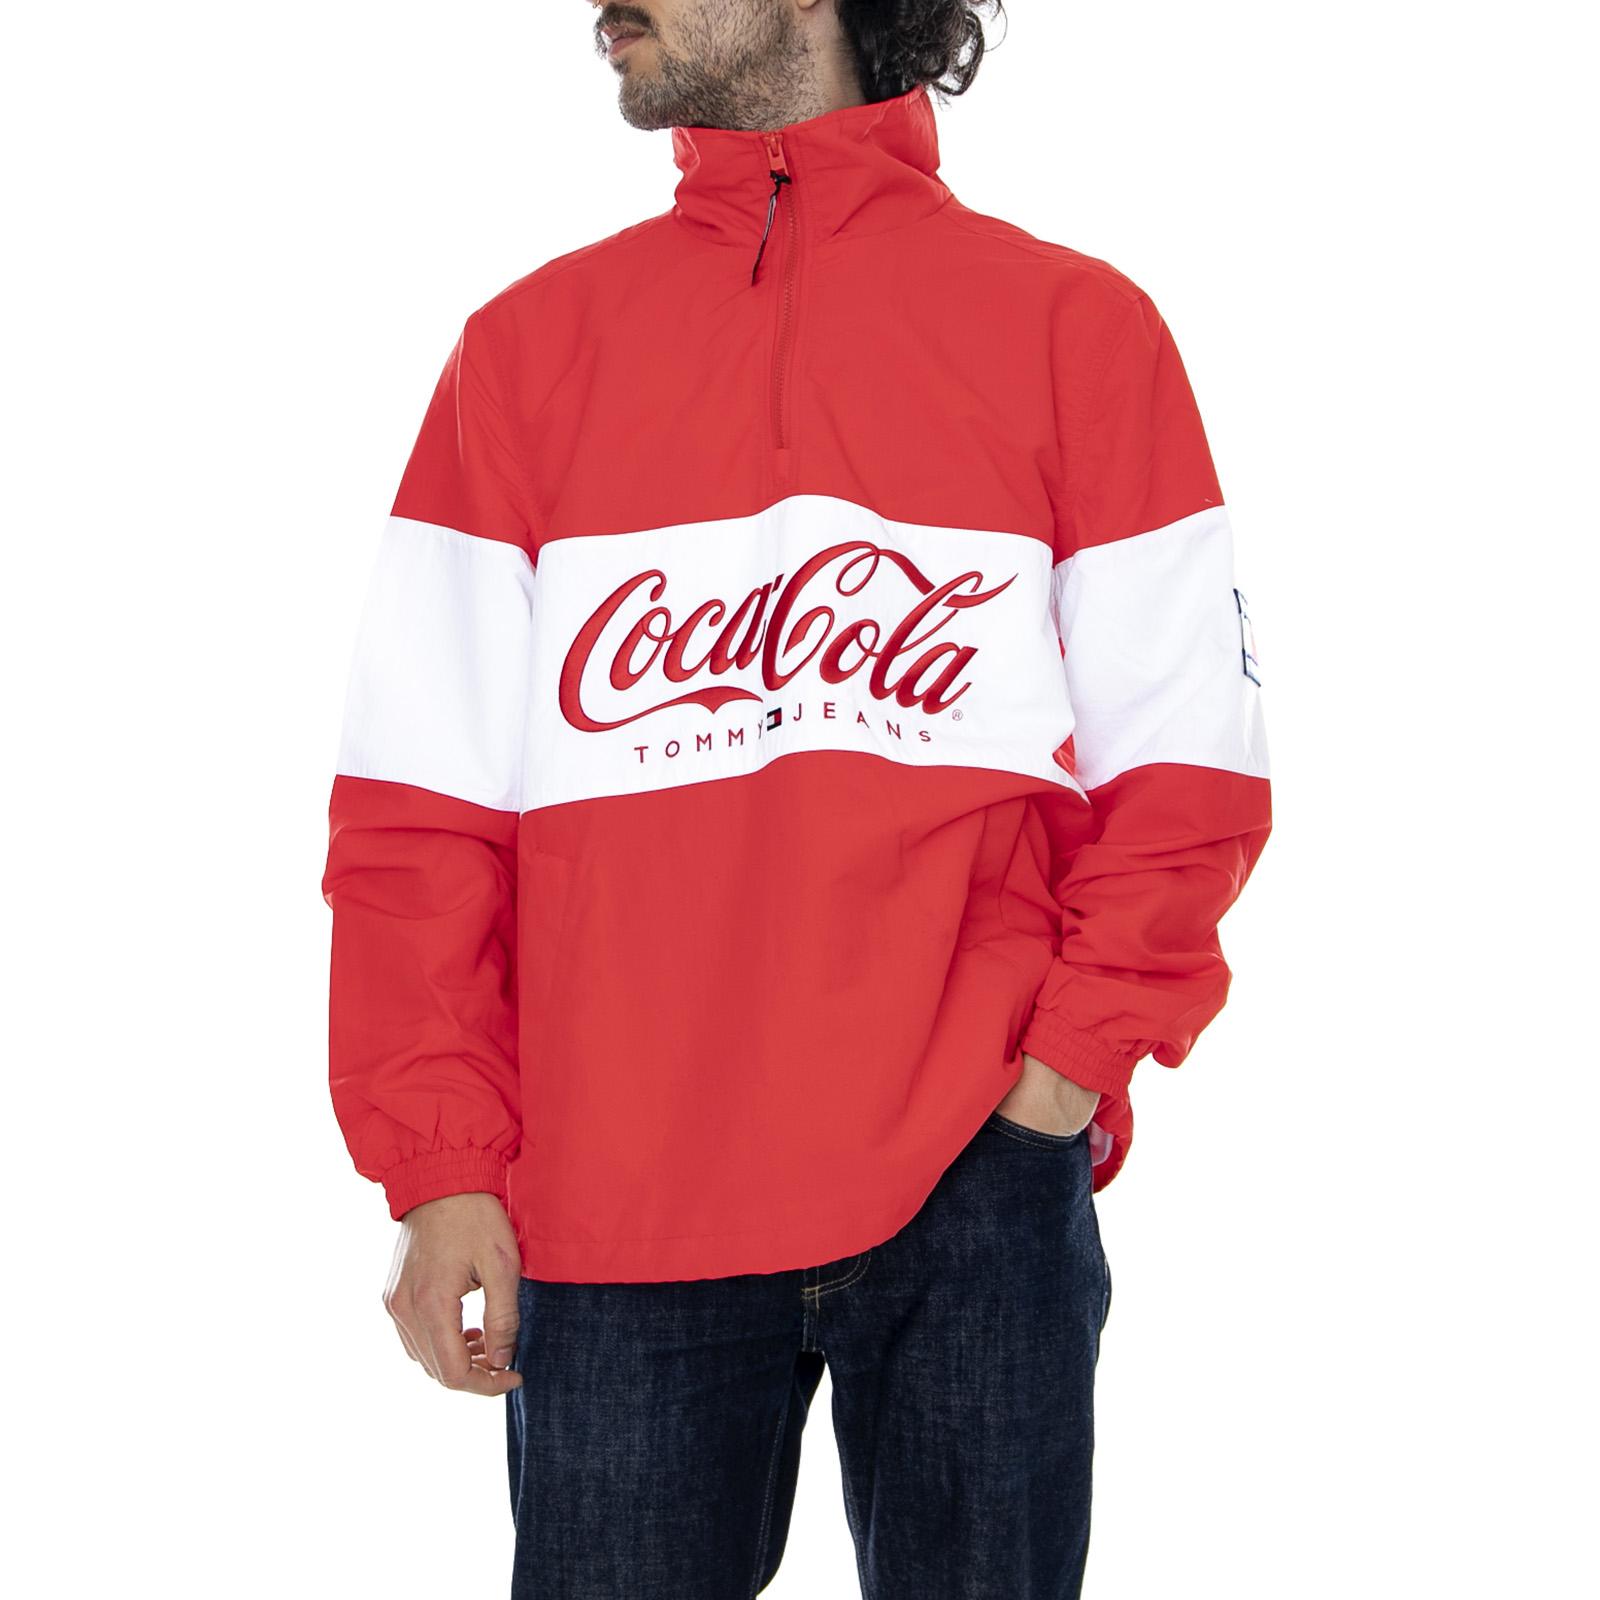 Details about Tommy Hilfiger Tjm Tommy x Coca Cola Pullover Jacket RedWhite Jacket Light